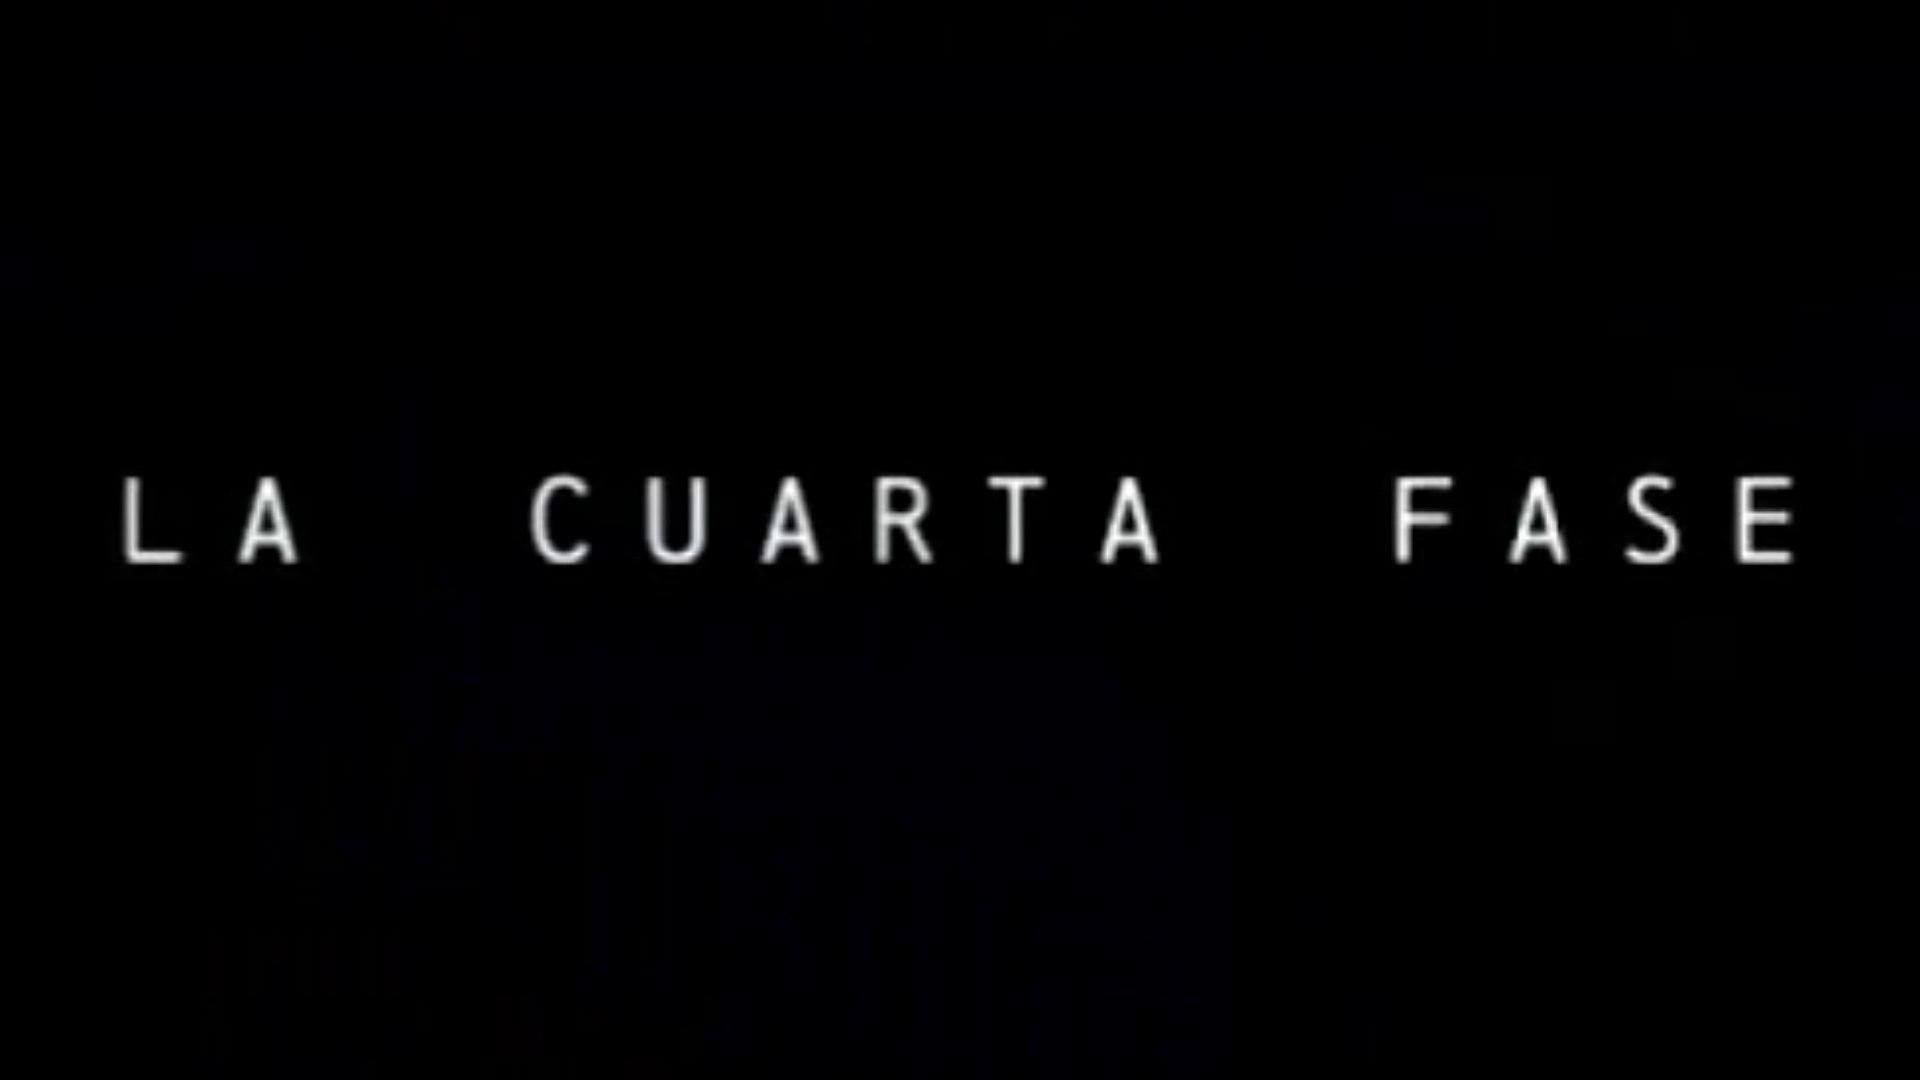 LA CUARTA FASE (2009) Trailer - SPANISH - Vidéo dailymotion